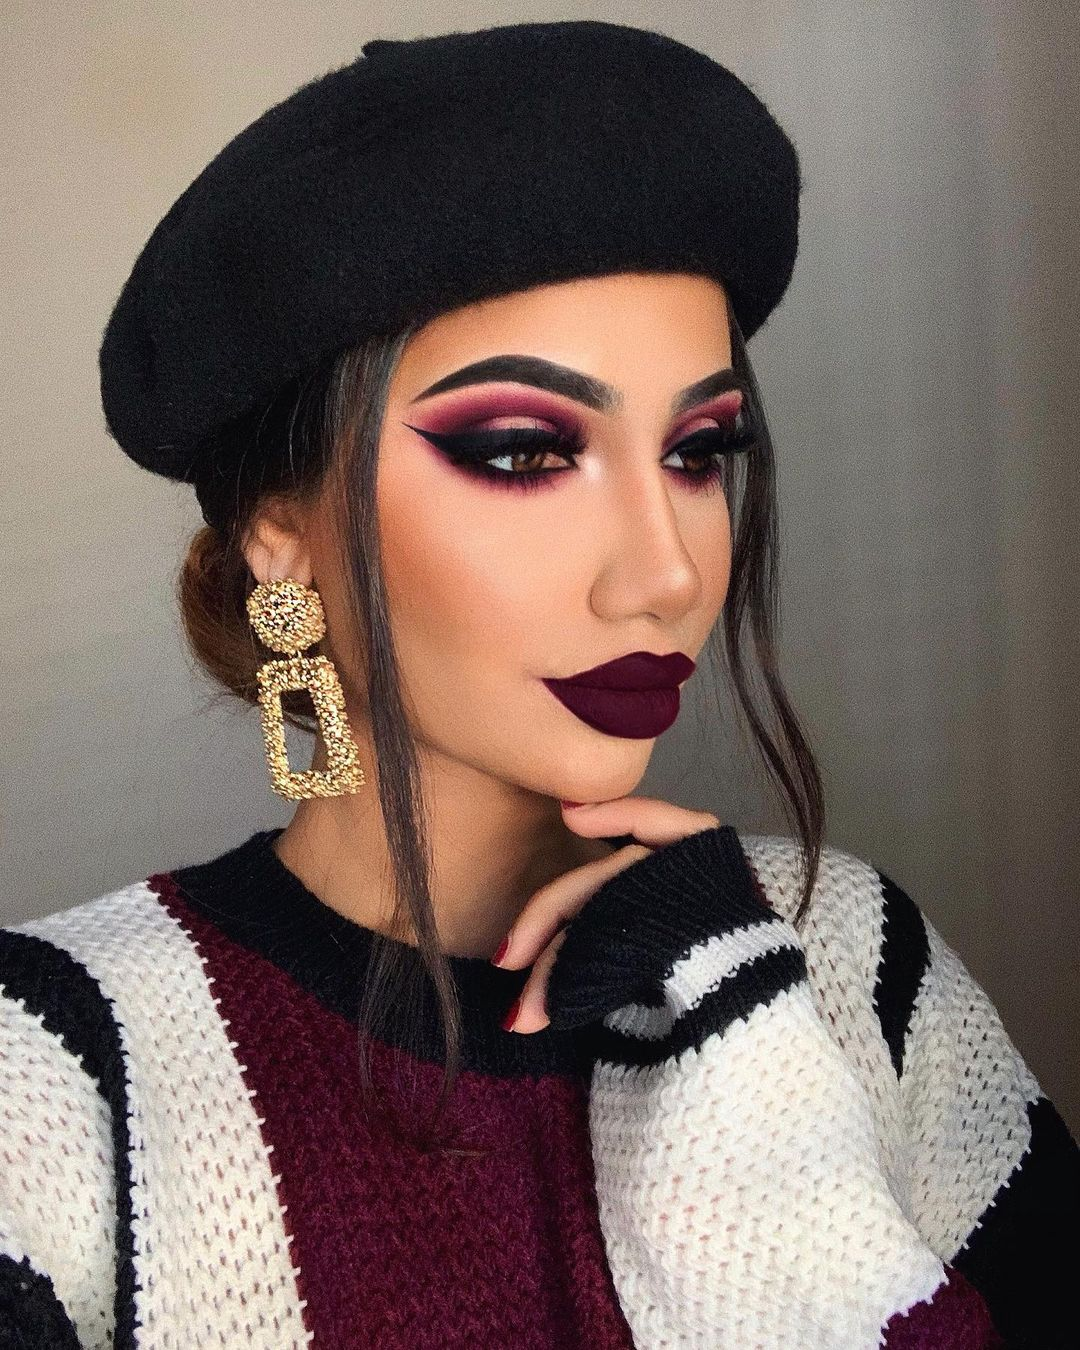 Makeupbyalinna-Wallpapers-Insta-Fit-Bio-10